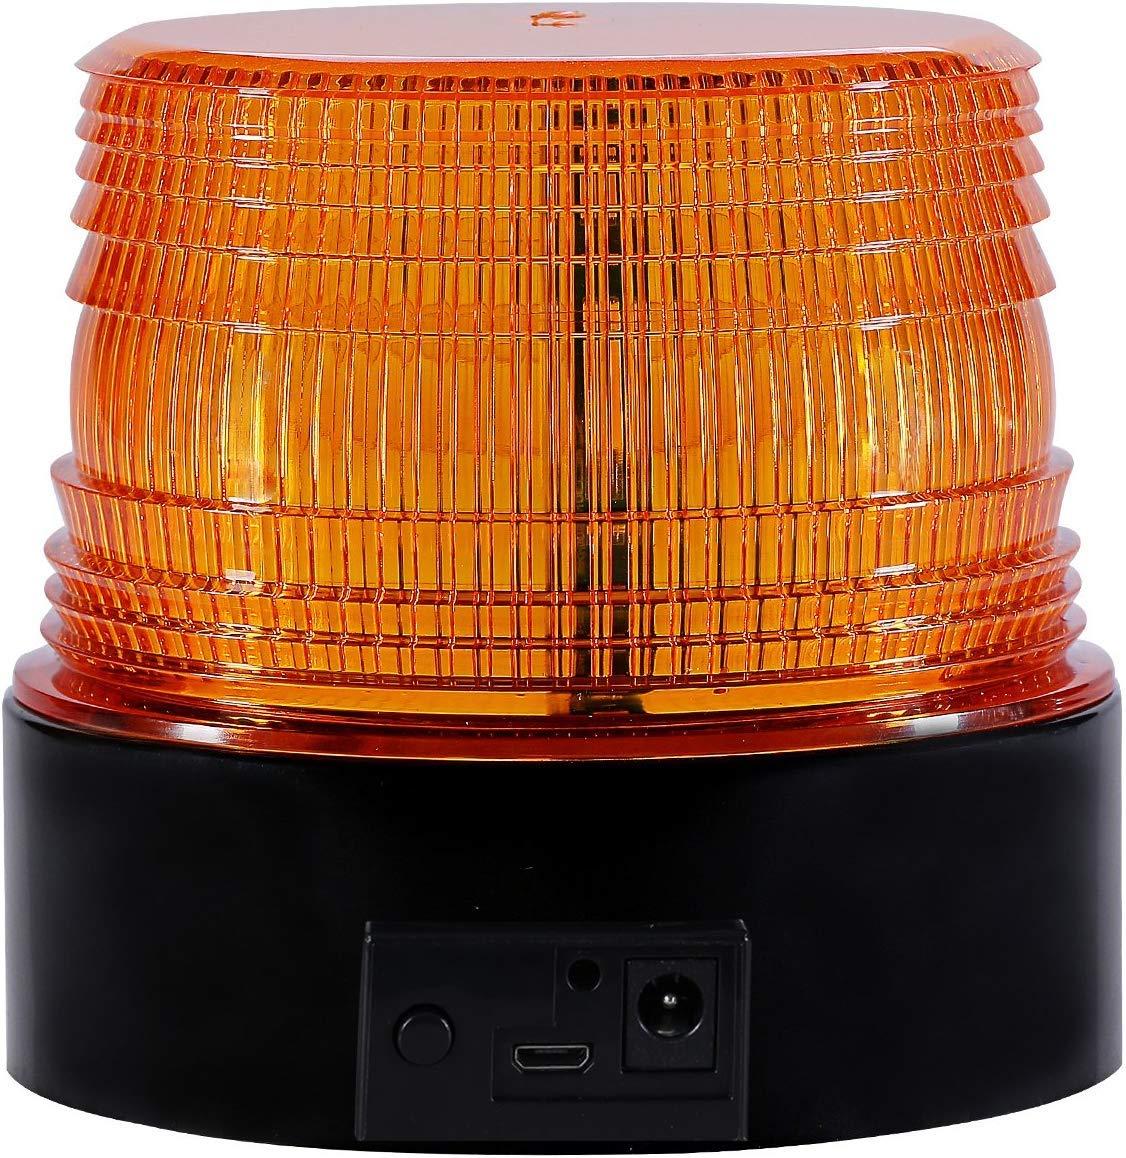 KINOEE Gyrophare Orange LED phare d/'avertissement clignotant pour auto v/éhicule avec magnetique durgence signalement lumi/ères 12 V